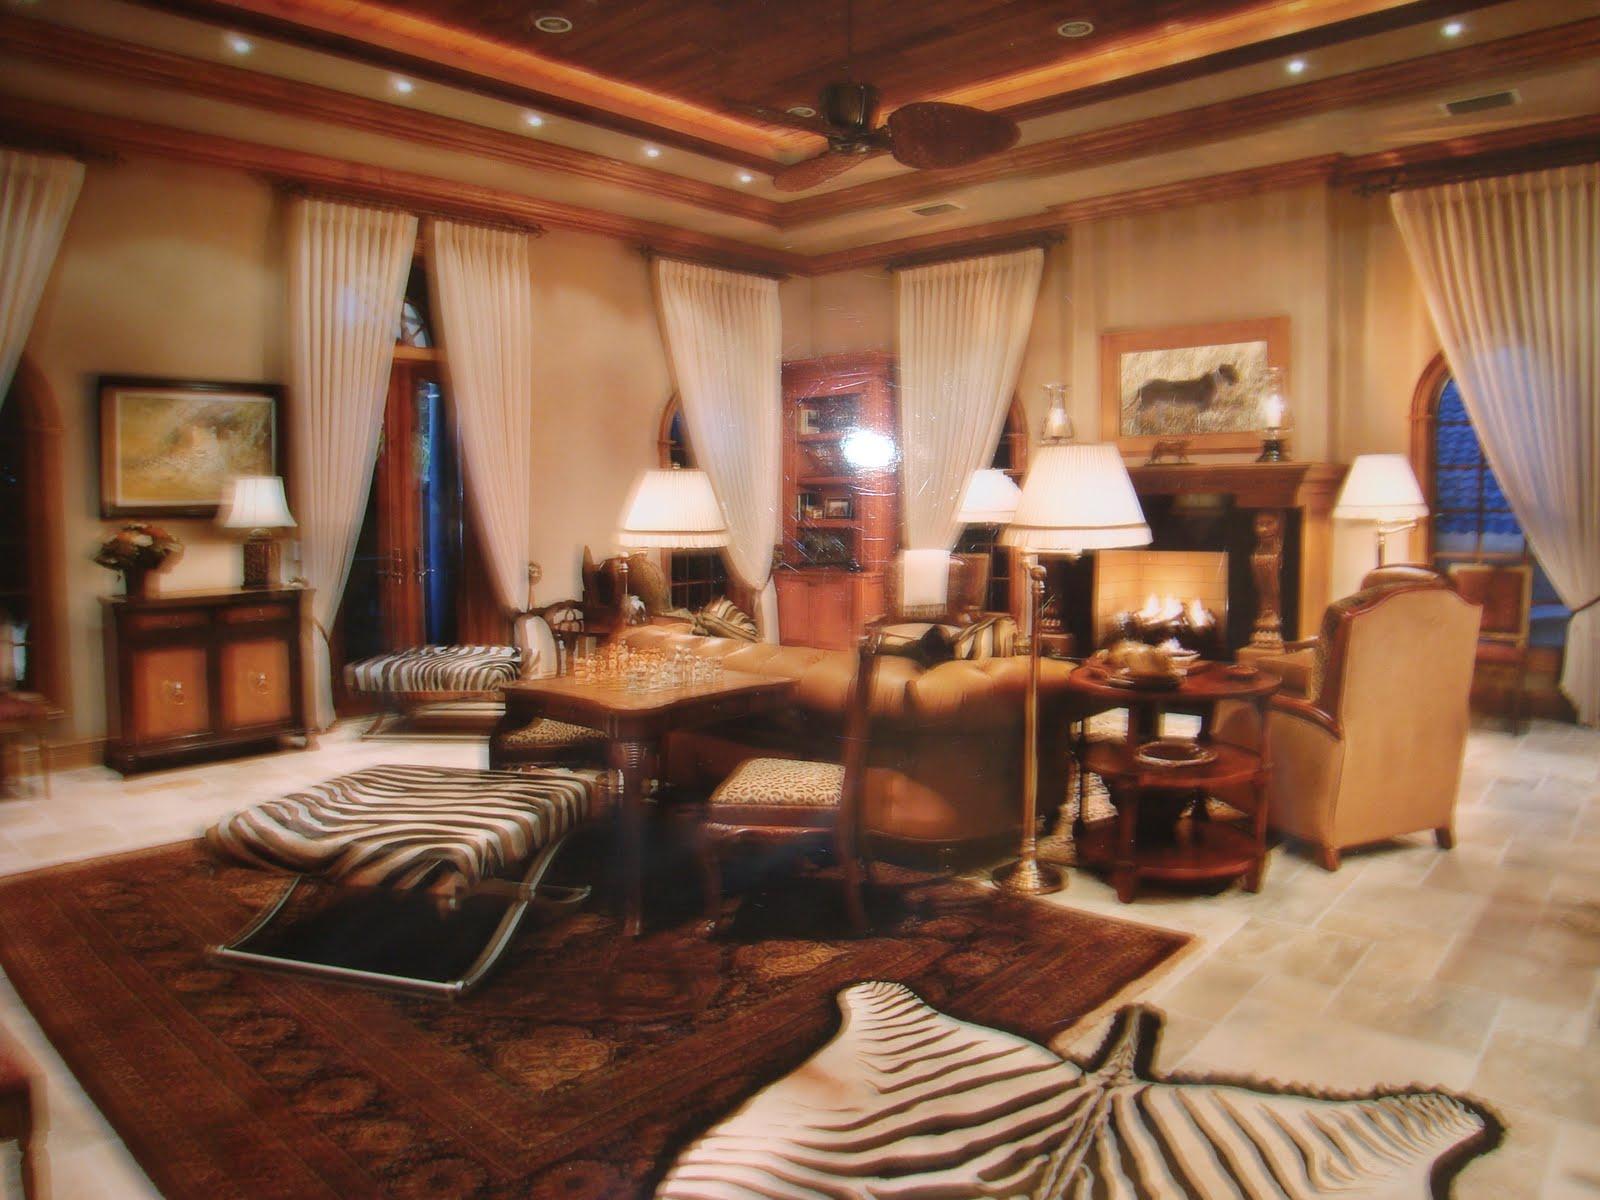 Dean farris style trophy room naples for Trophy room design